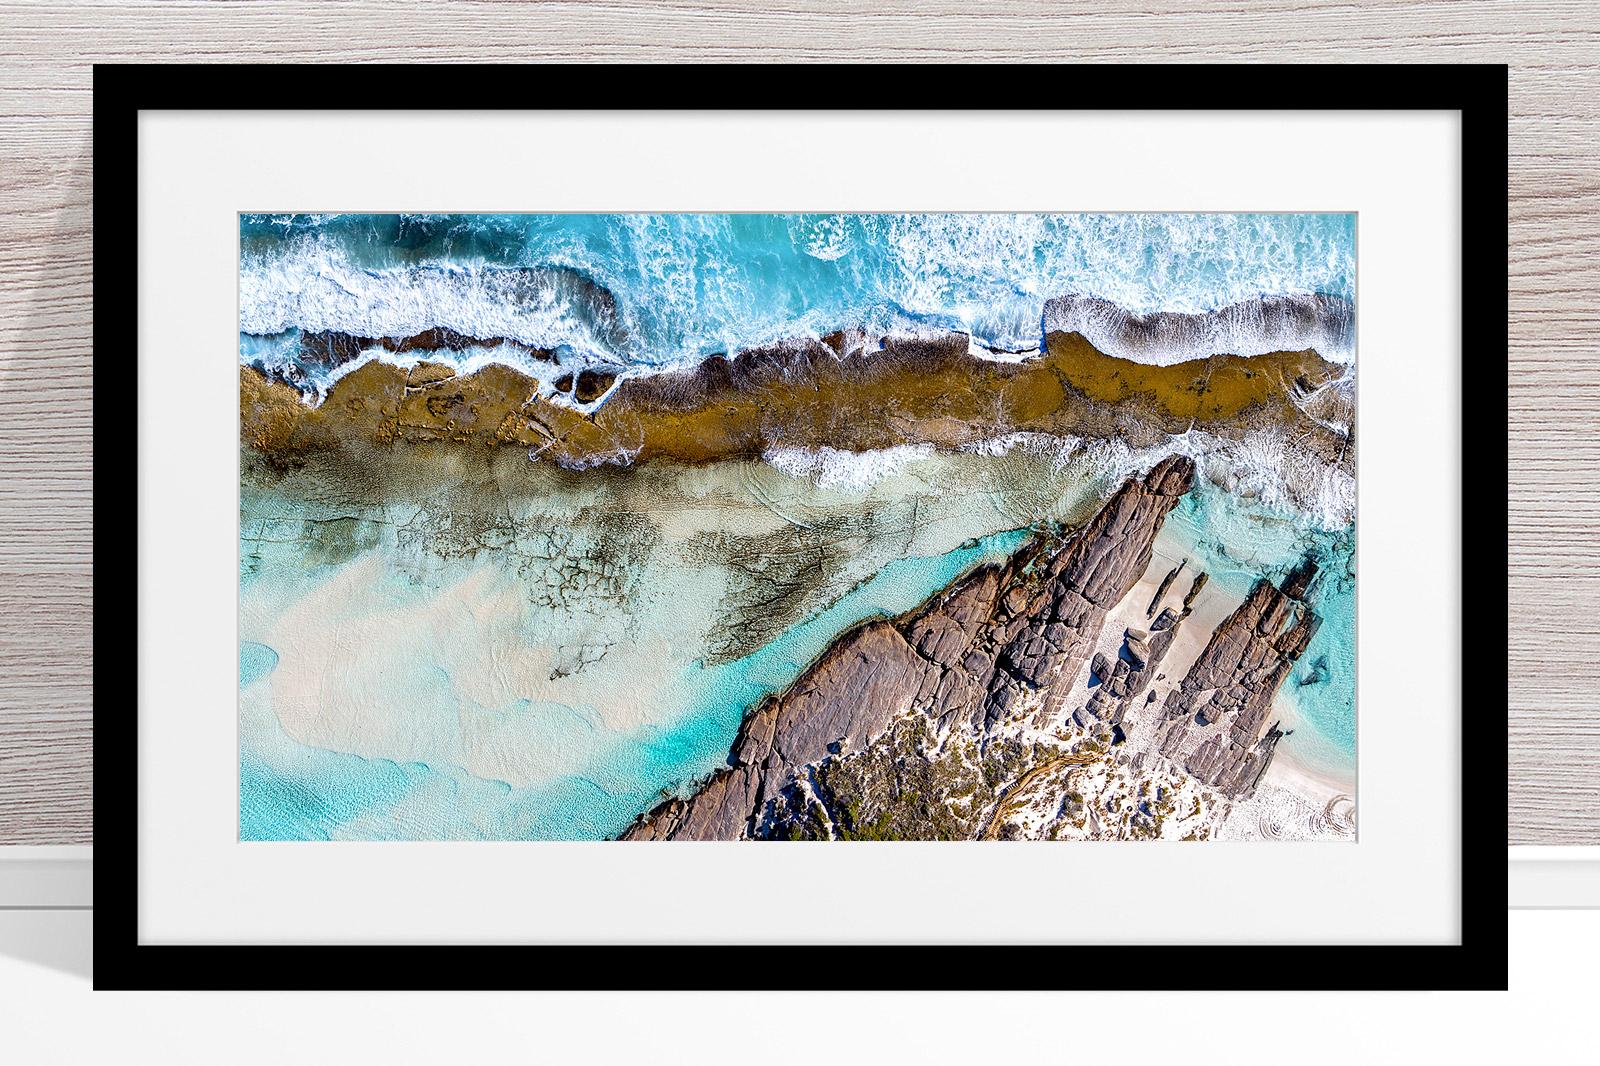 010 - Jason Mazur - '11 Mile Beach, Esperance' Black Frame